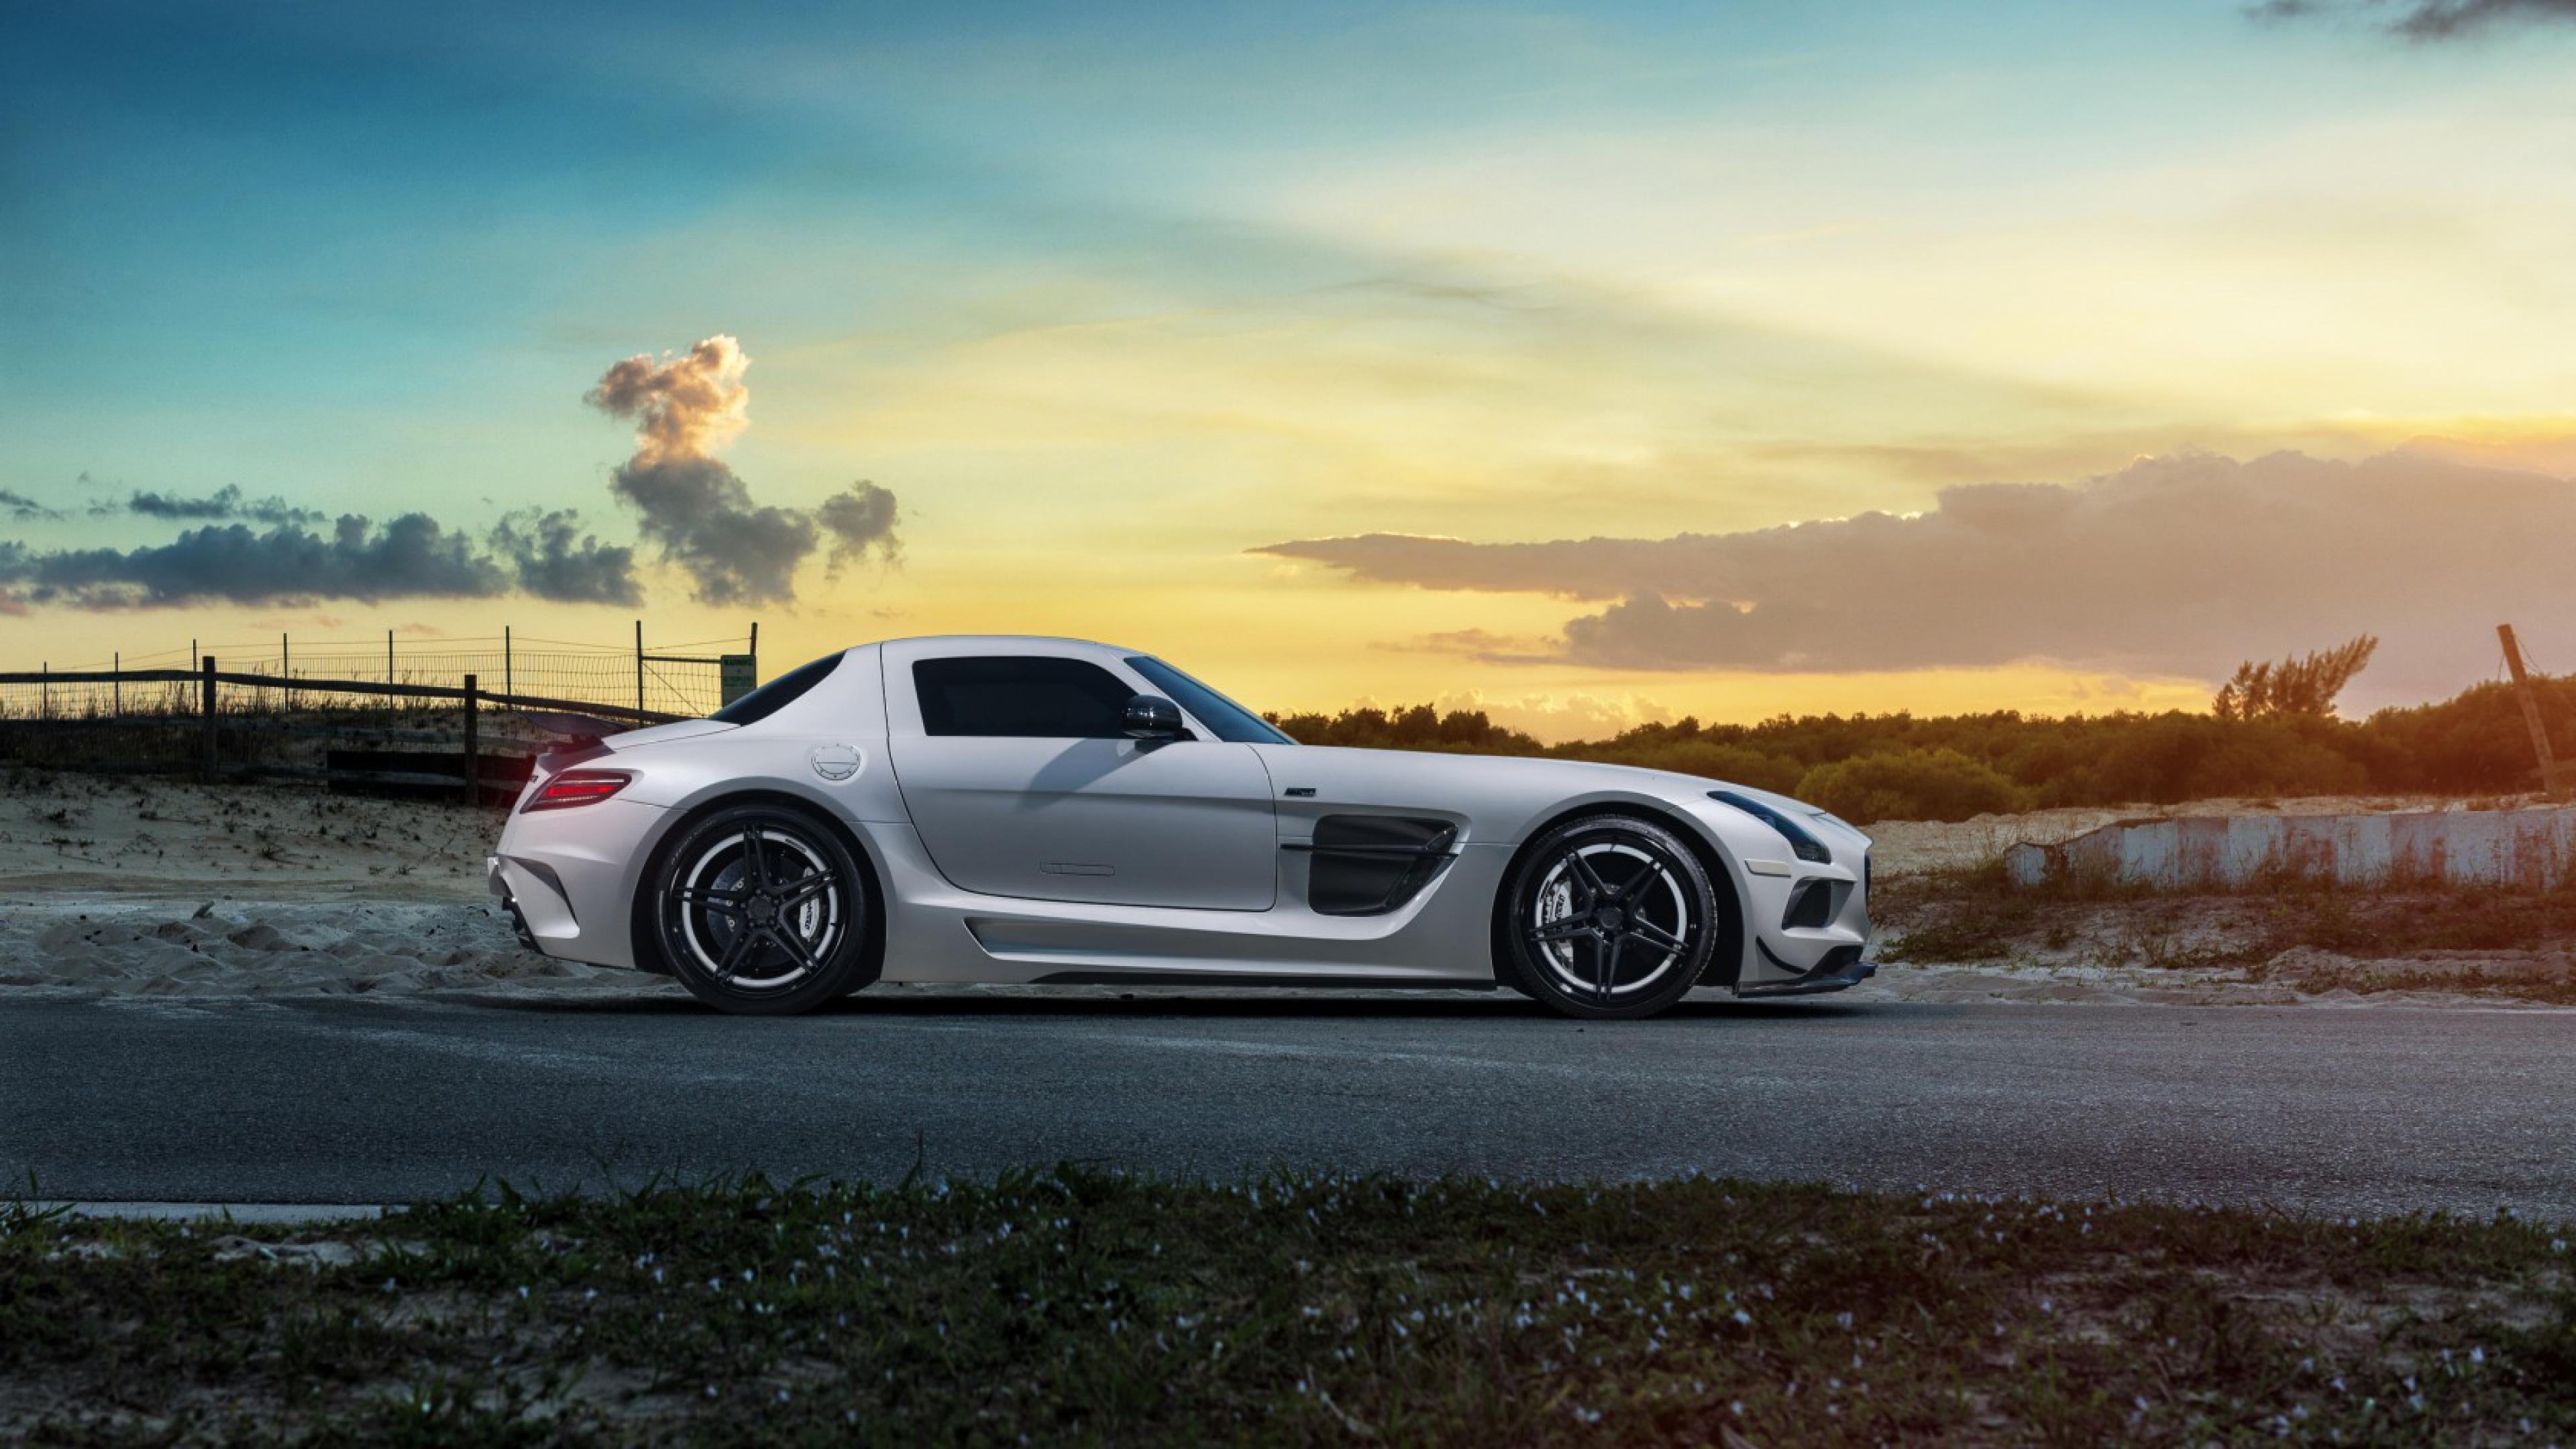 Mercedes Sls Black, HD Cars, 4k Wallpapers, Images ...